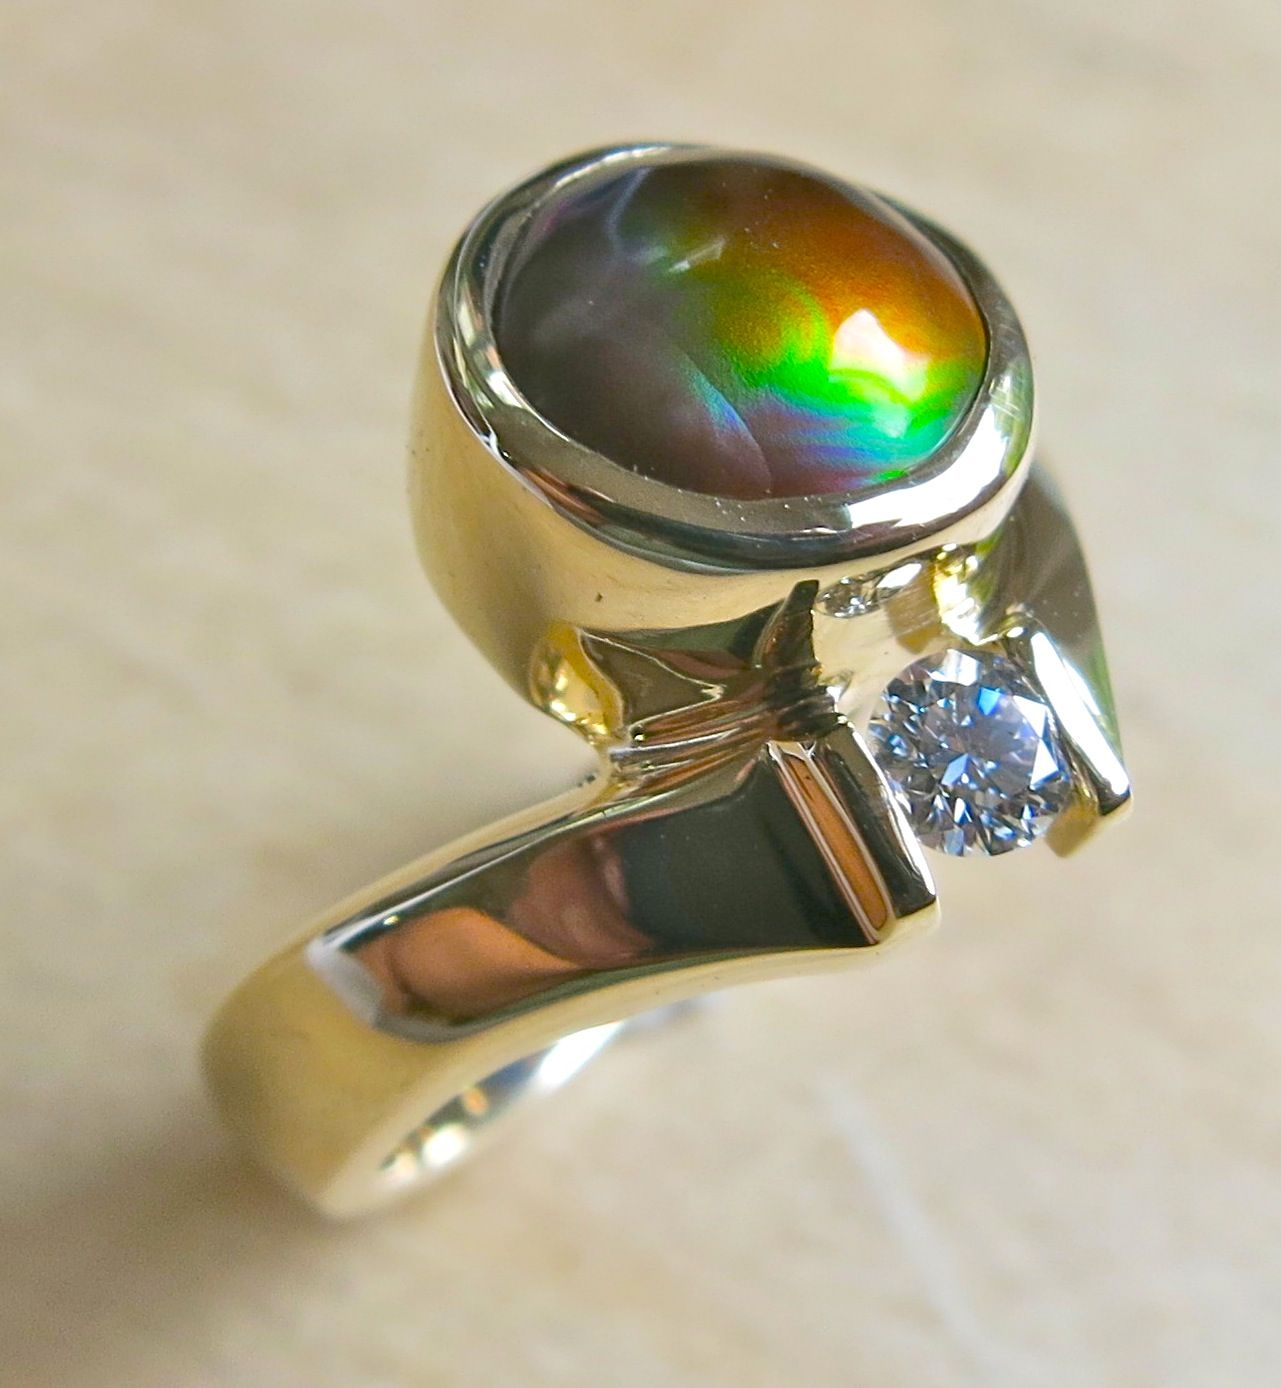 One of a kind 14K yellow gold fire agate and diamond ring by Glenn Dizon Designs.  Available, PM my Fb page, Glenn Dizon Designs